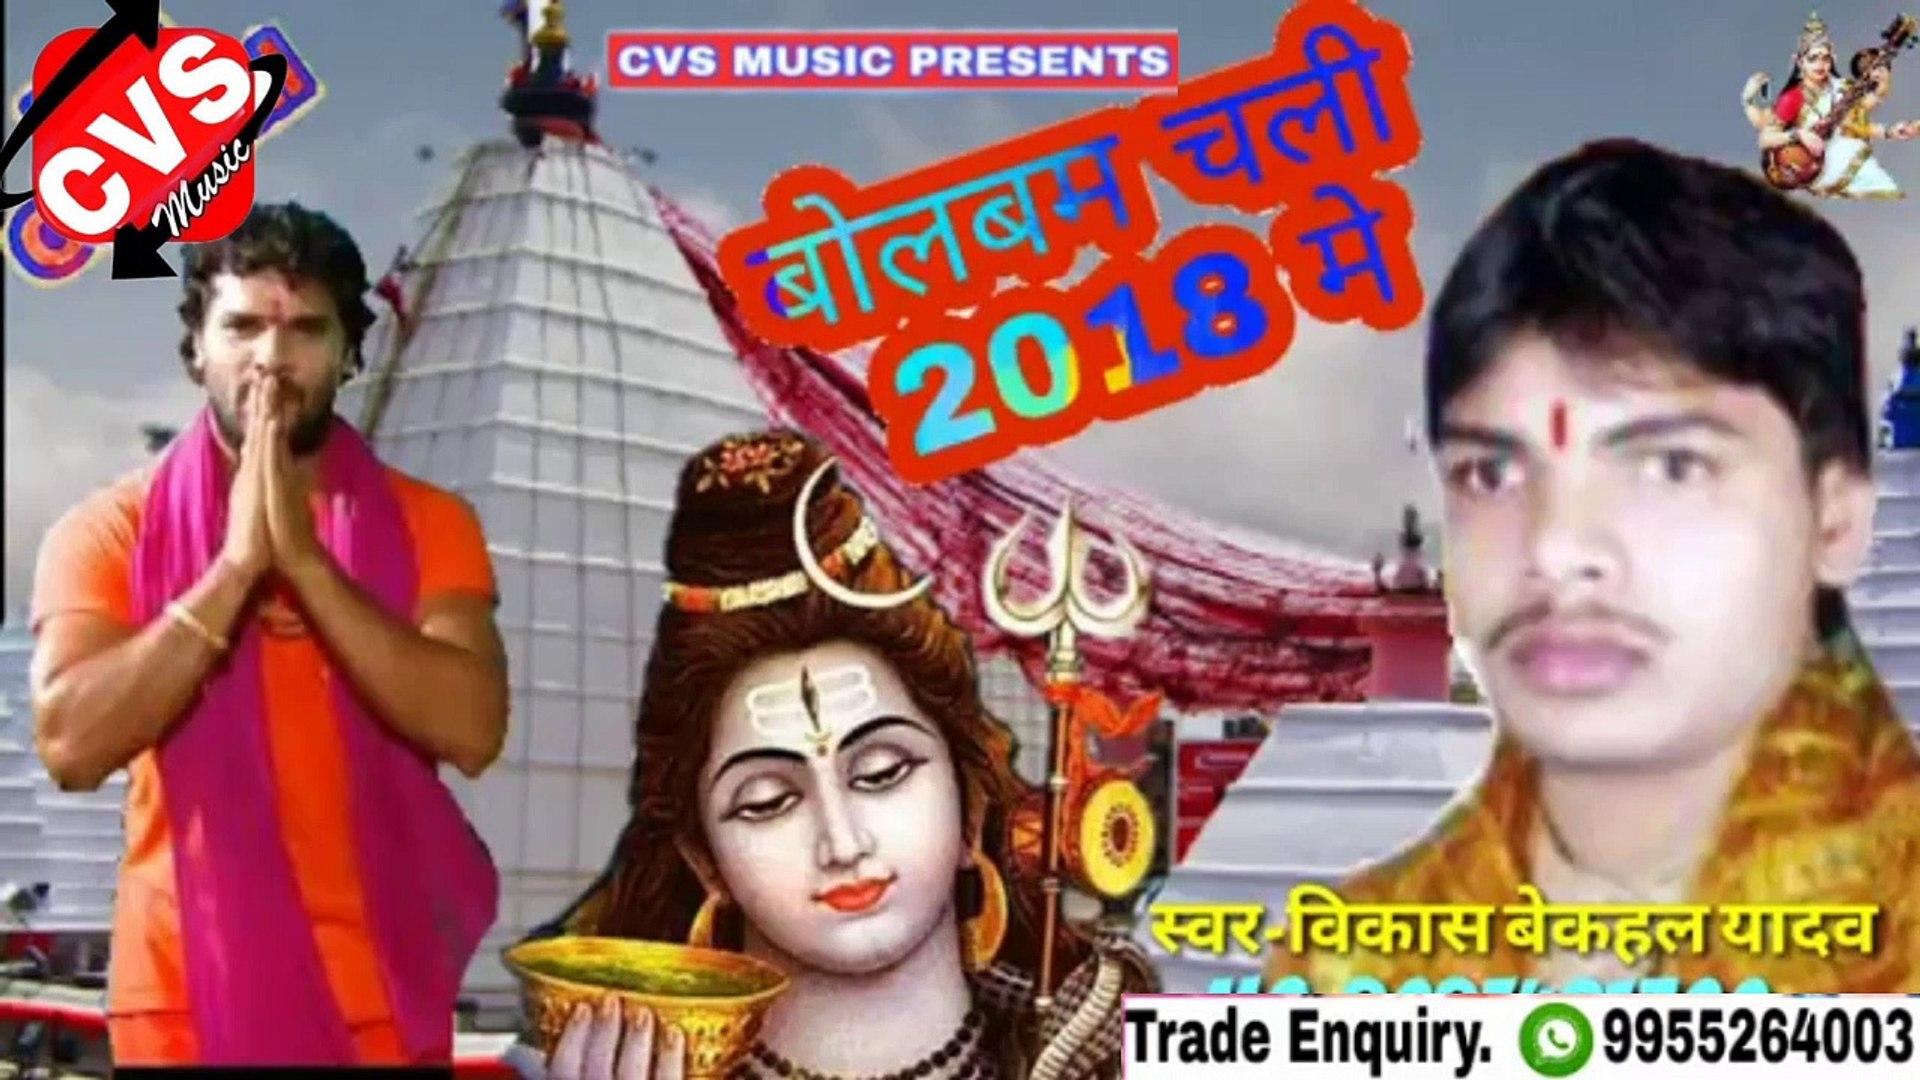 बोल बम चली 2020 मे |Vikash biswasi | Bol Bam Chali 2020 Me | Bolbam Song 2020 |